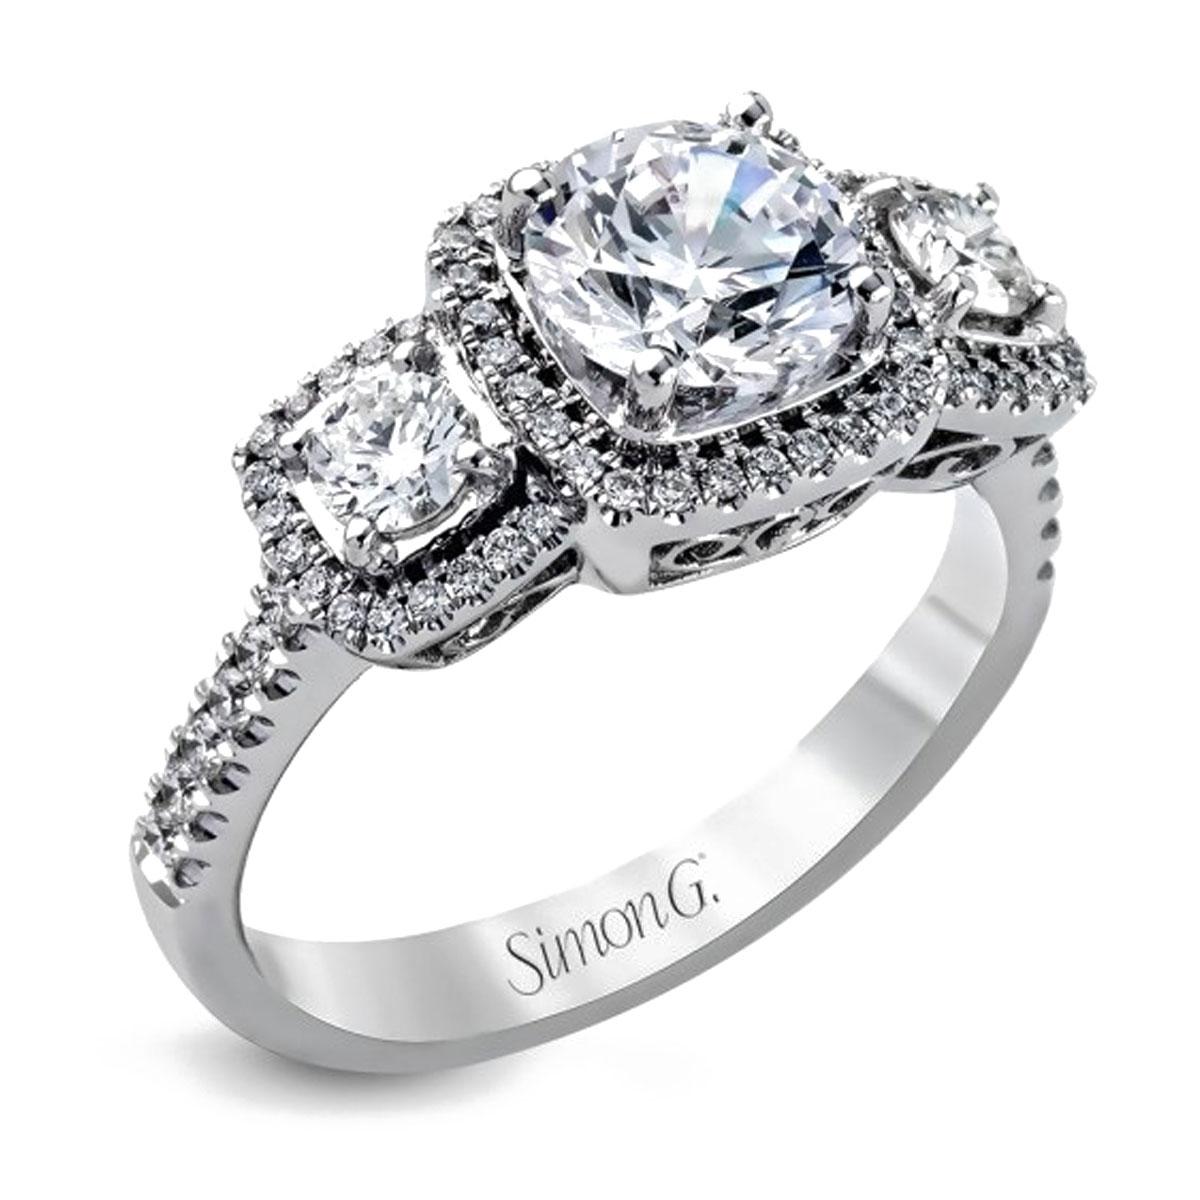 Simon G Engagement Rings 0 91ctw Diamond Accents